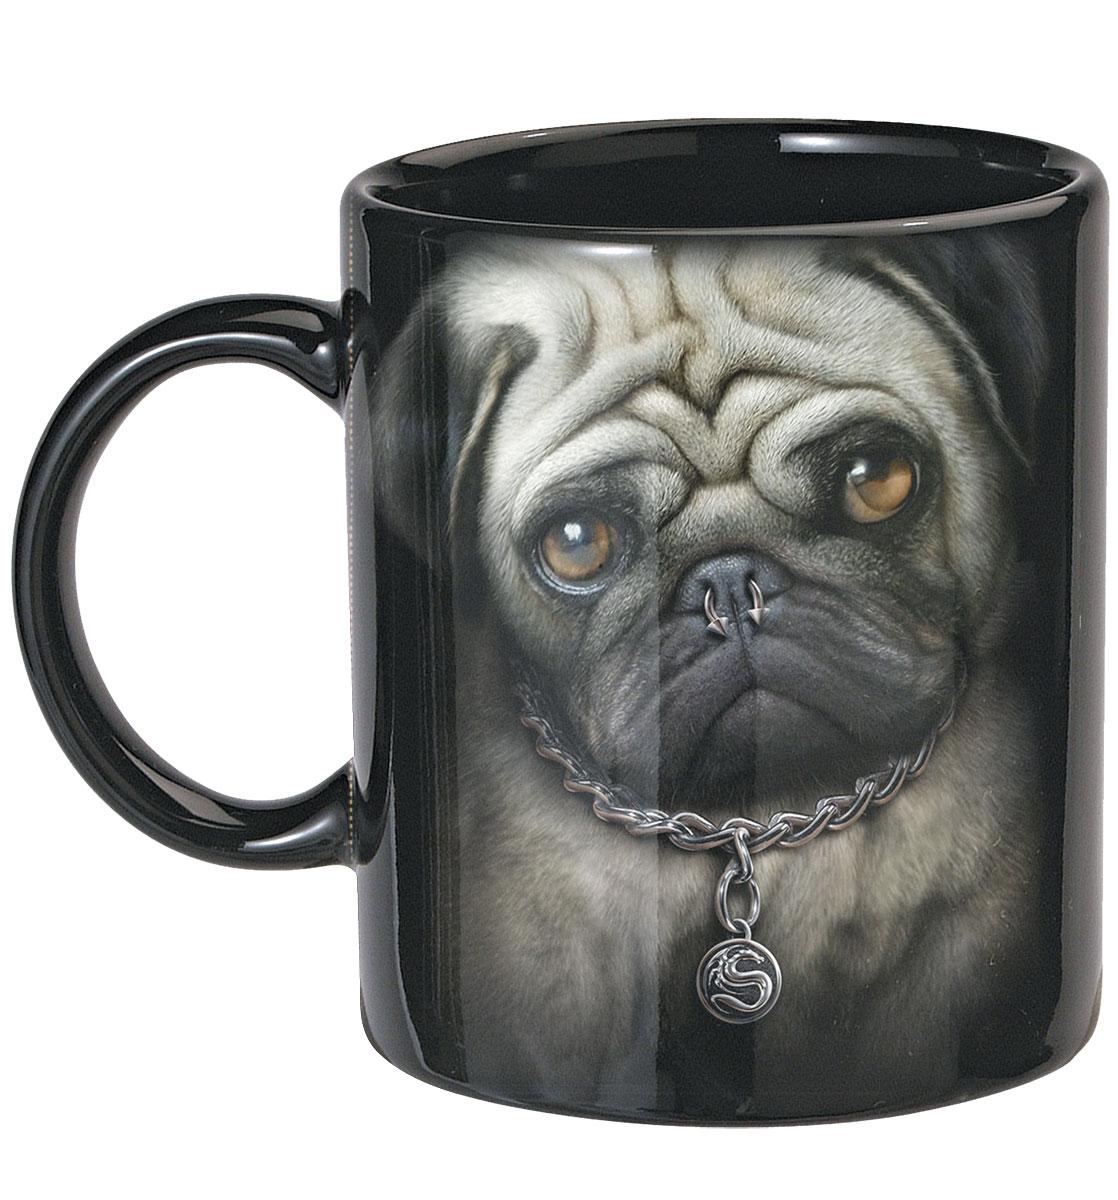 Pug Life Ceramic Mugs 0.3L - Set Of 2